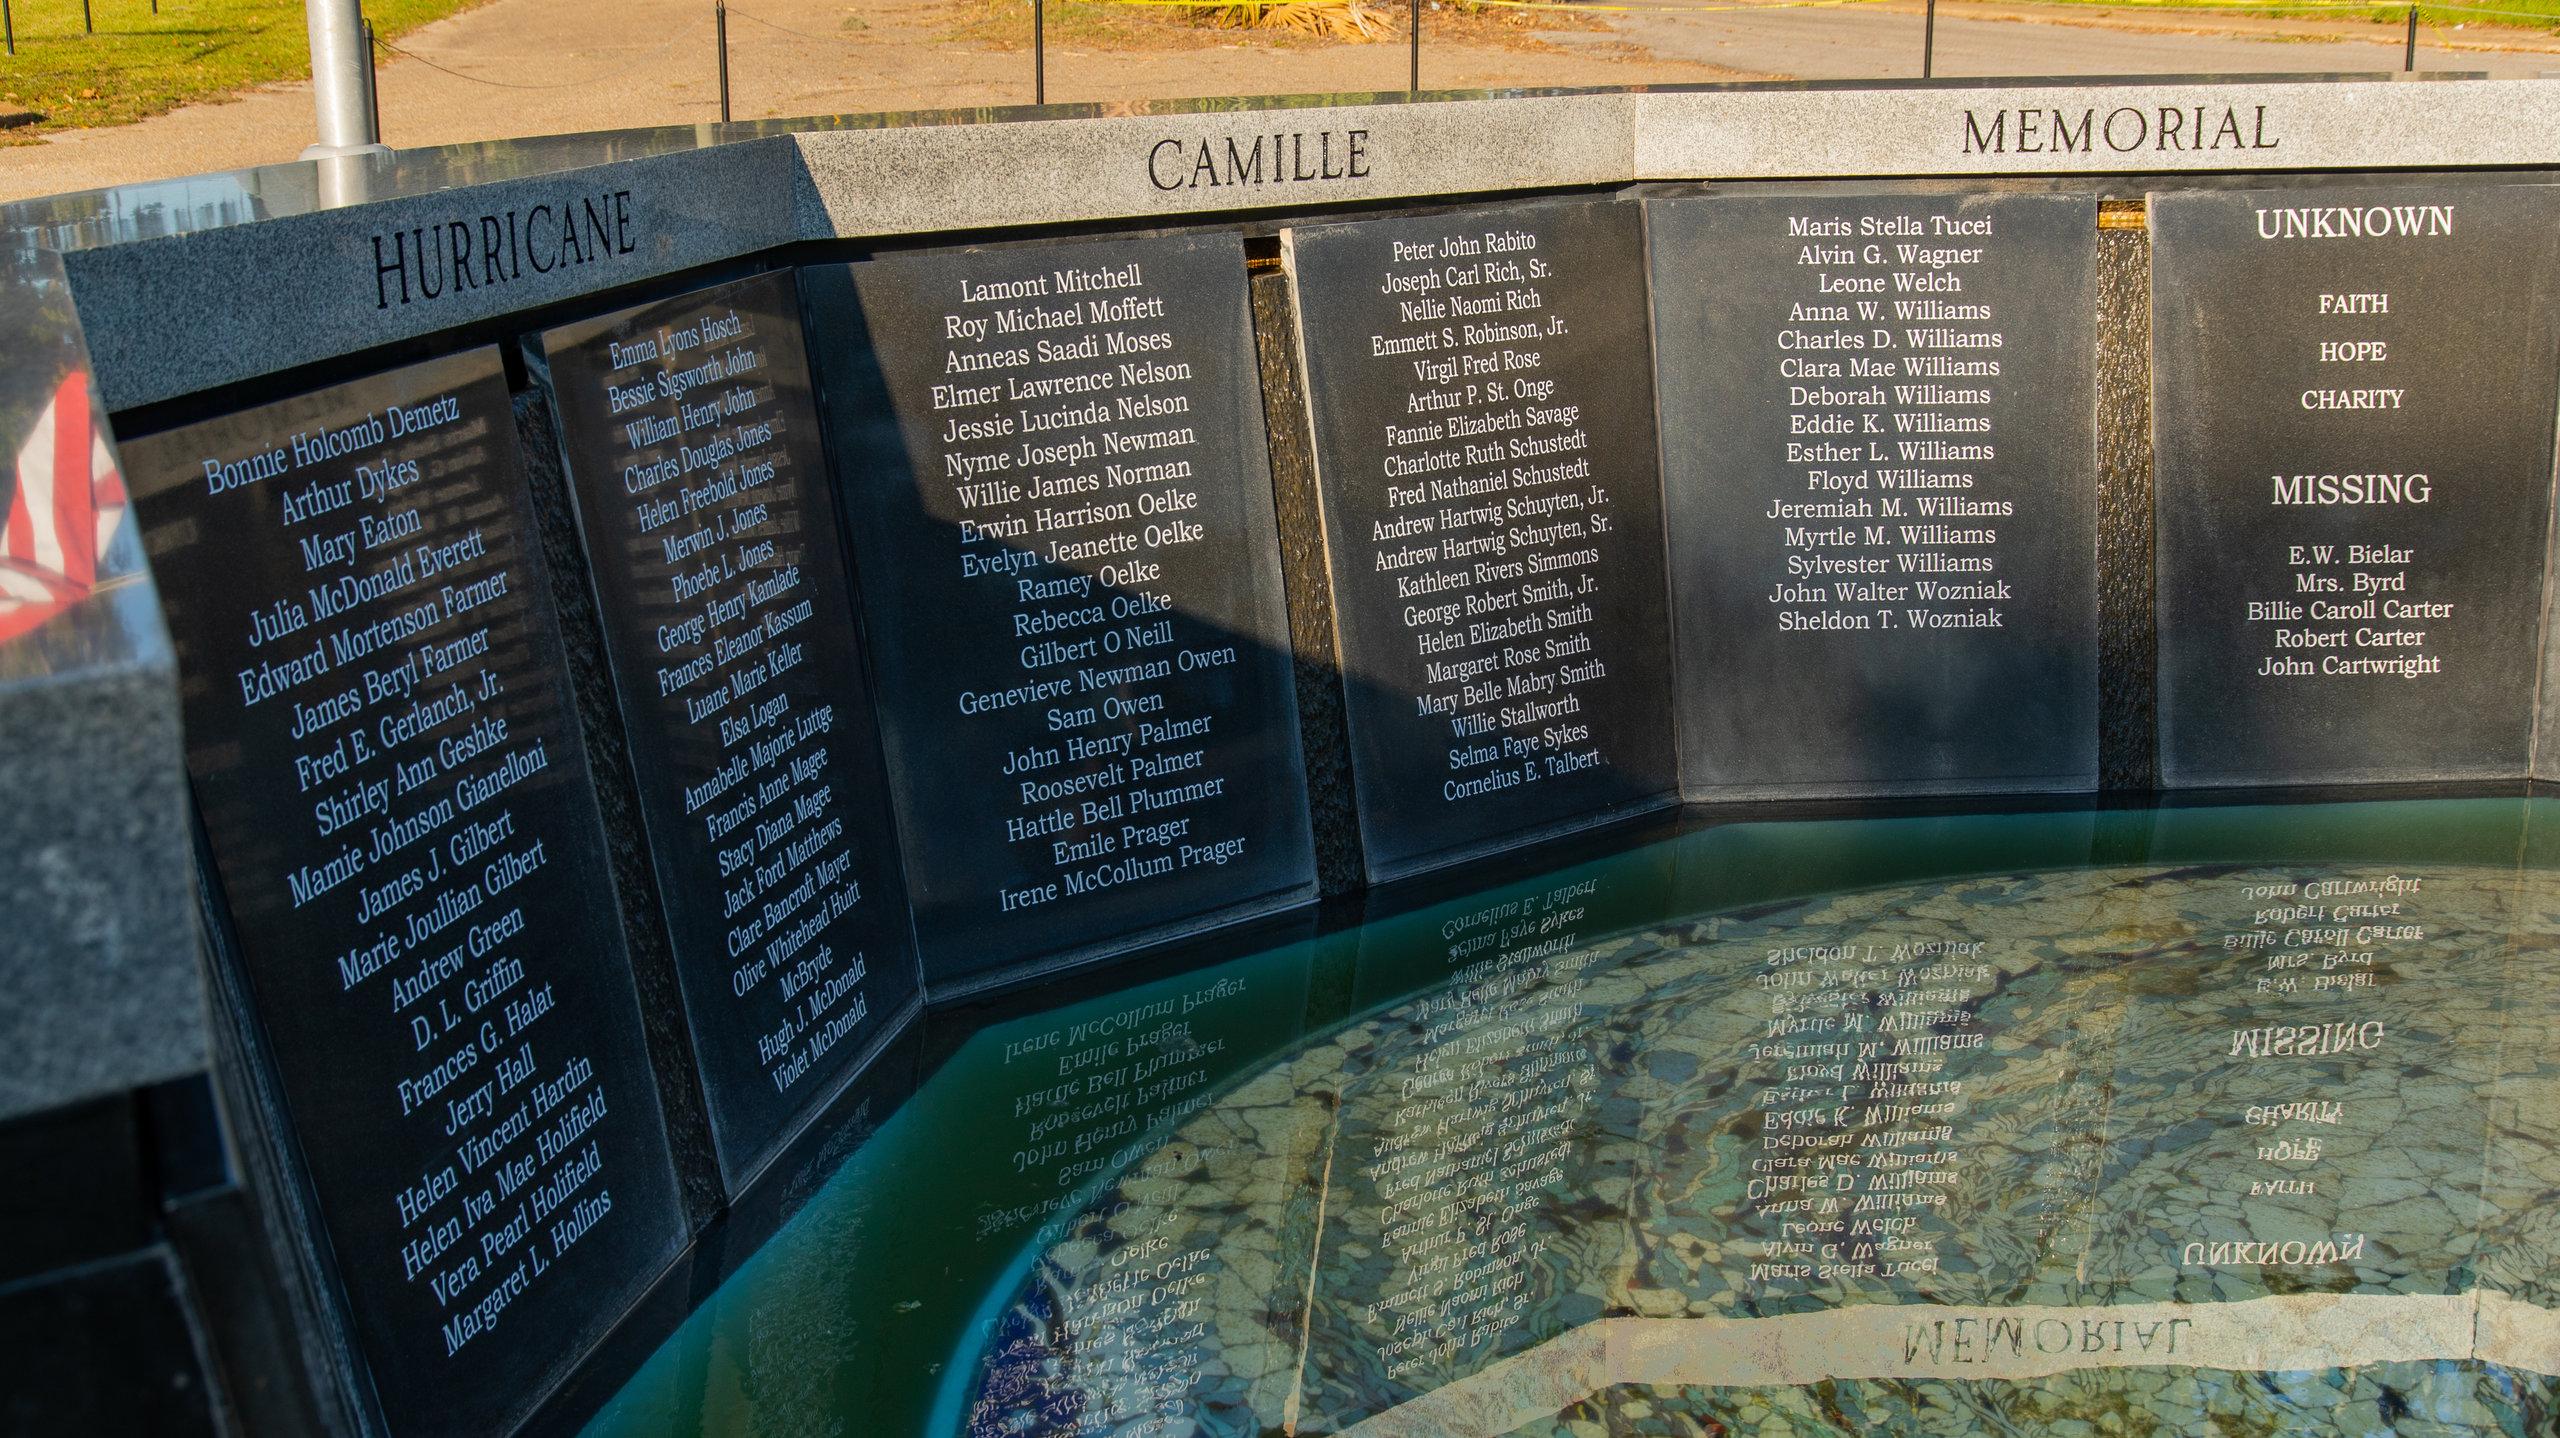 Hurricane Camille Memorial, East Biloxi, Mississippi, United States of America